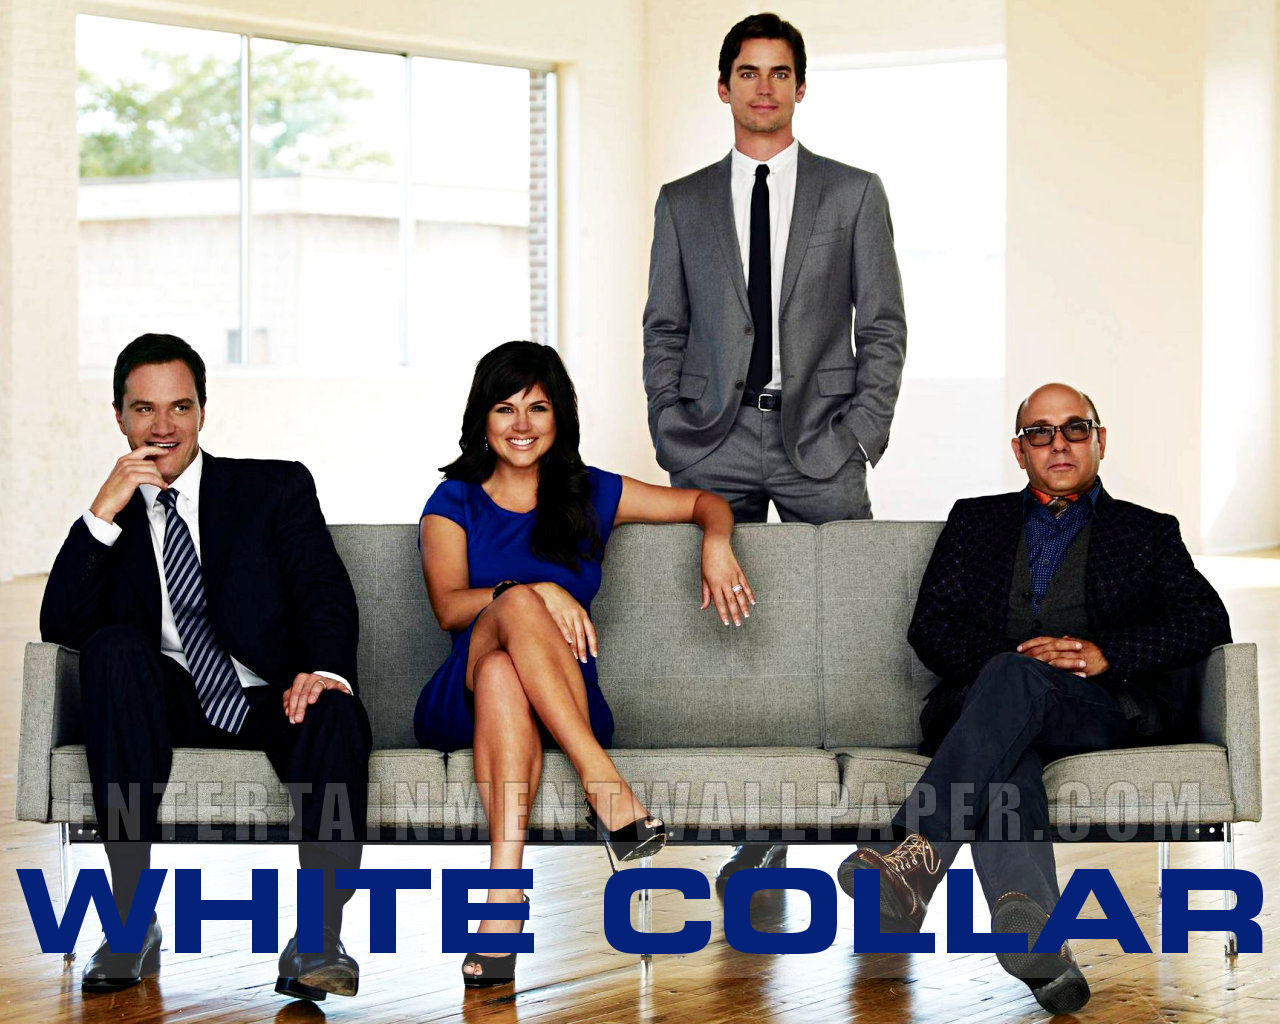 El mundo enamorado: White Collar